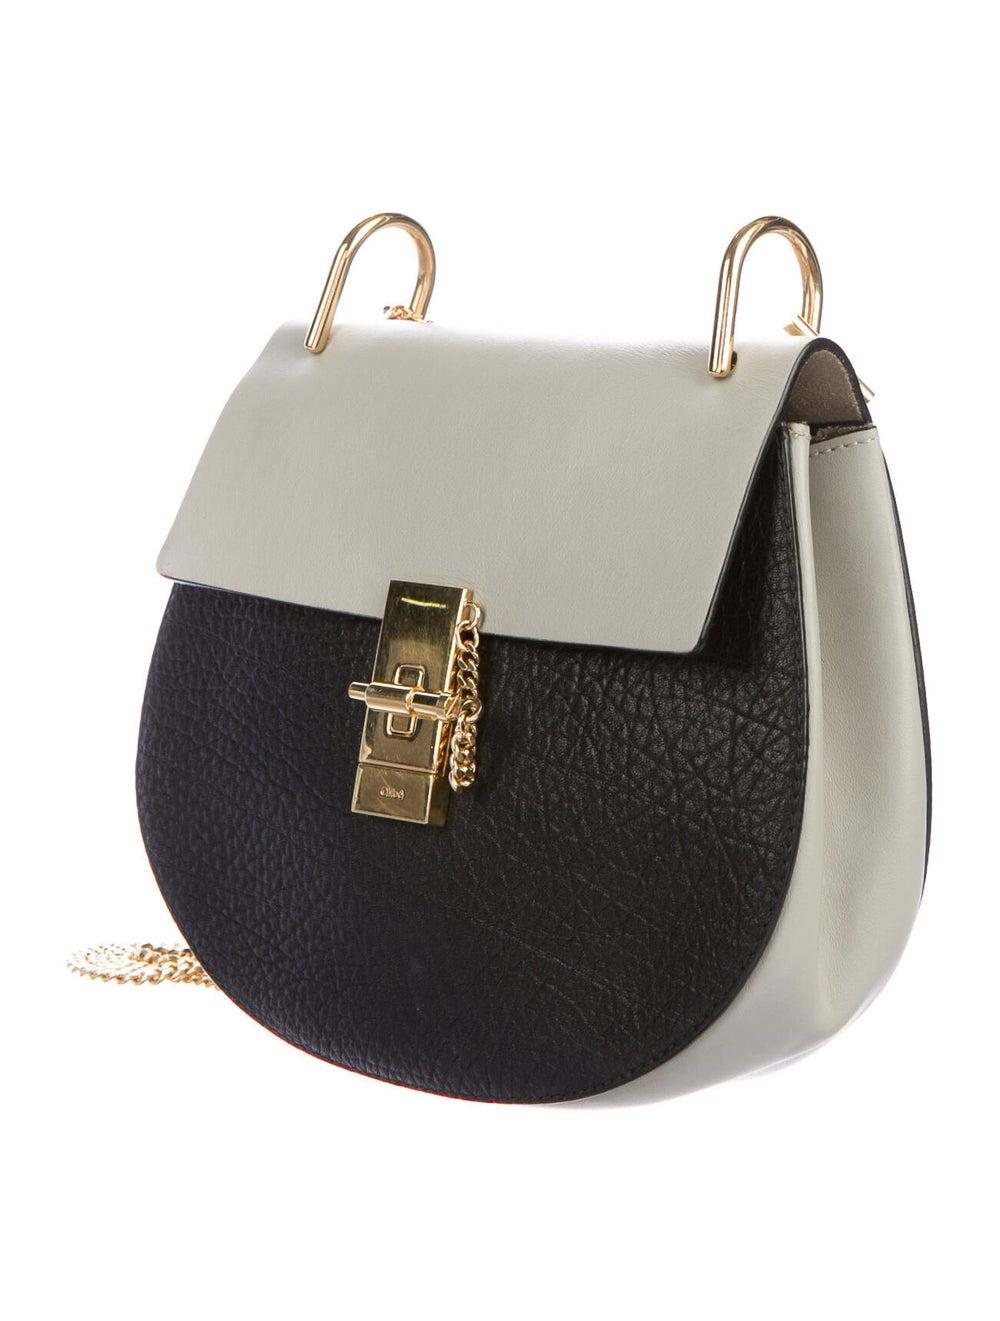 Chloé Leather Drew Crossbody Bag Black - image 3